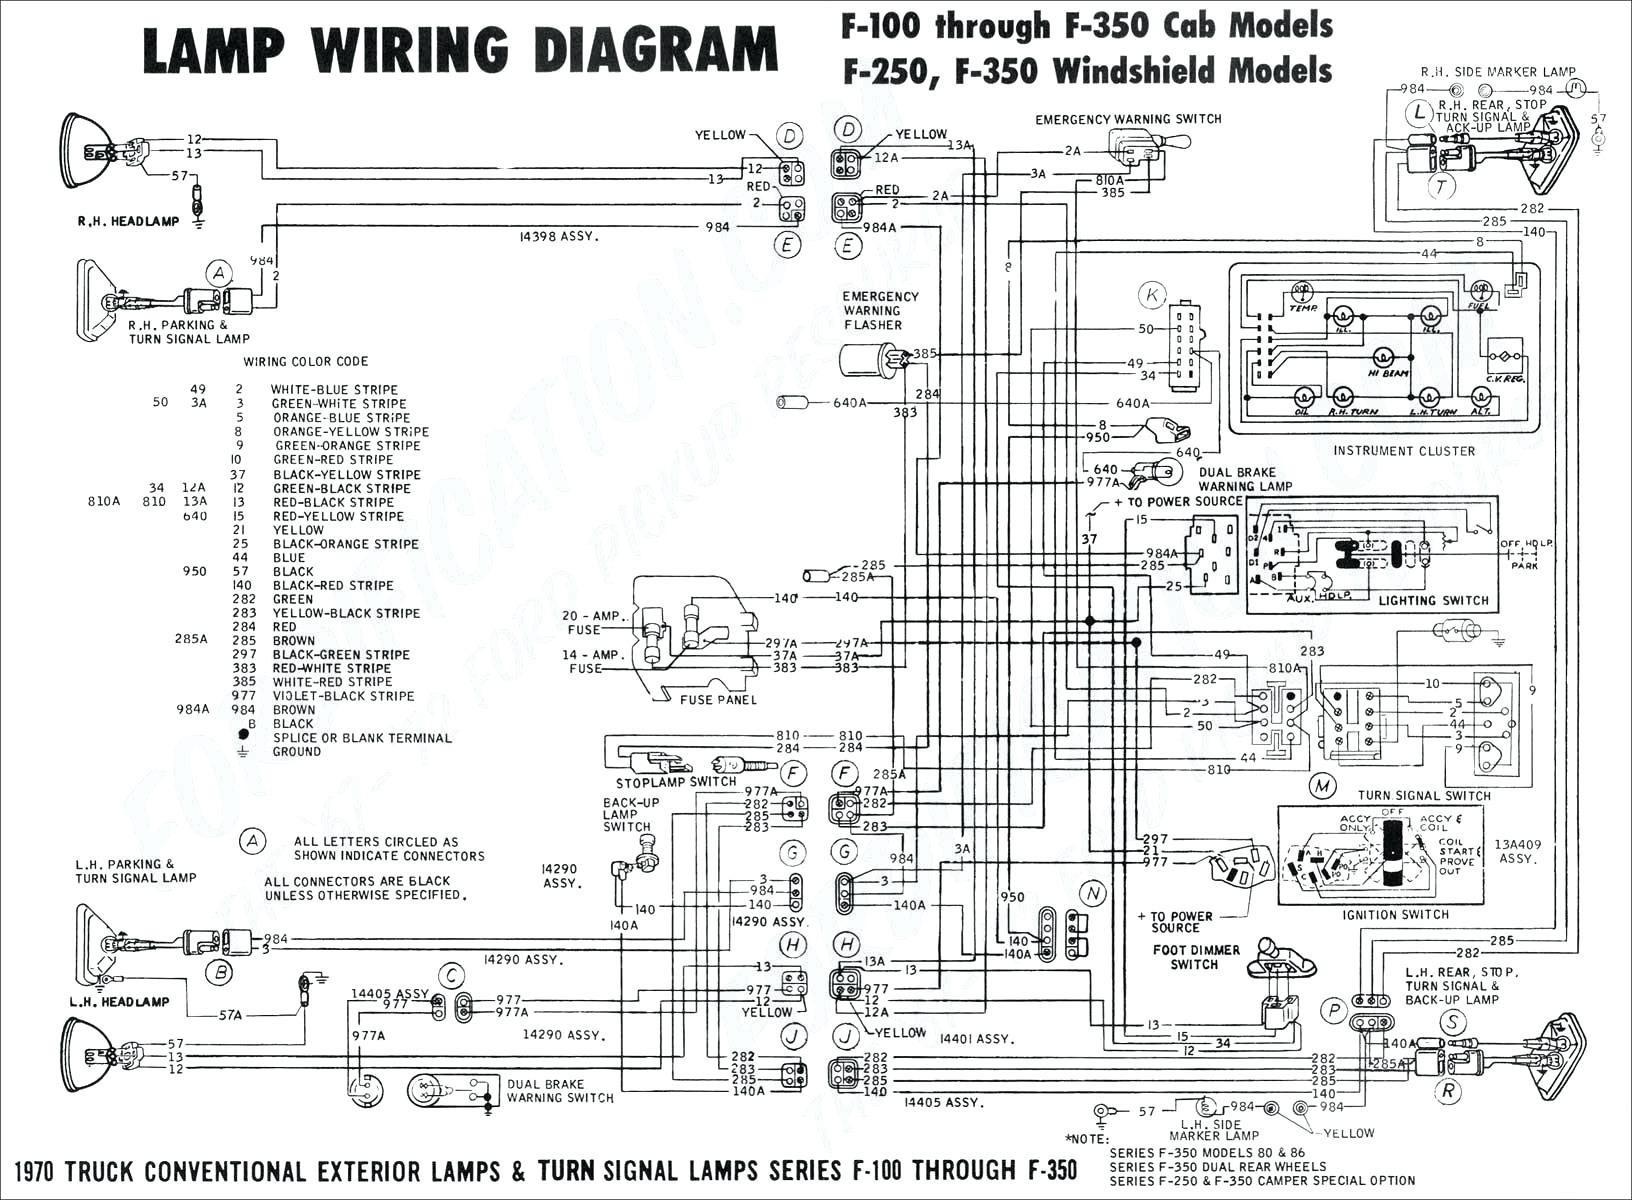 Gntx 313 10 Pin Wiring Diagram 00 Nissan Altima Fuse Box Of Gntx 313 10 Pin Wiring Diagram